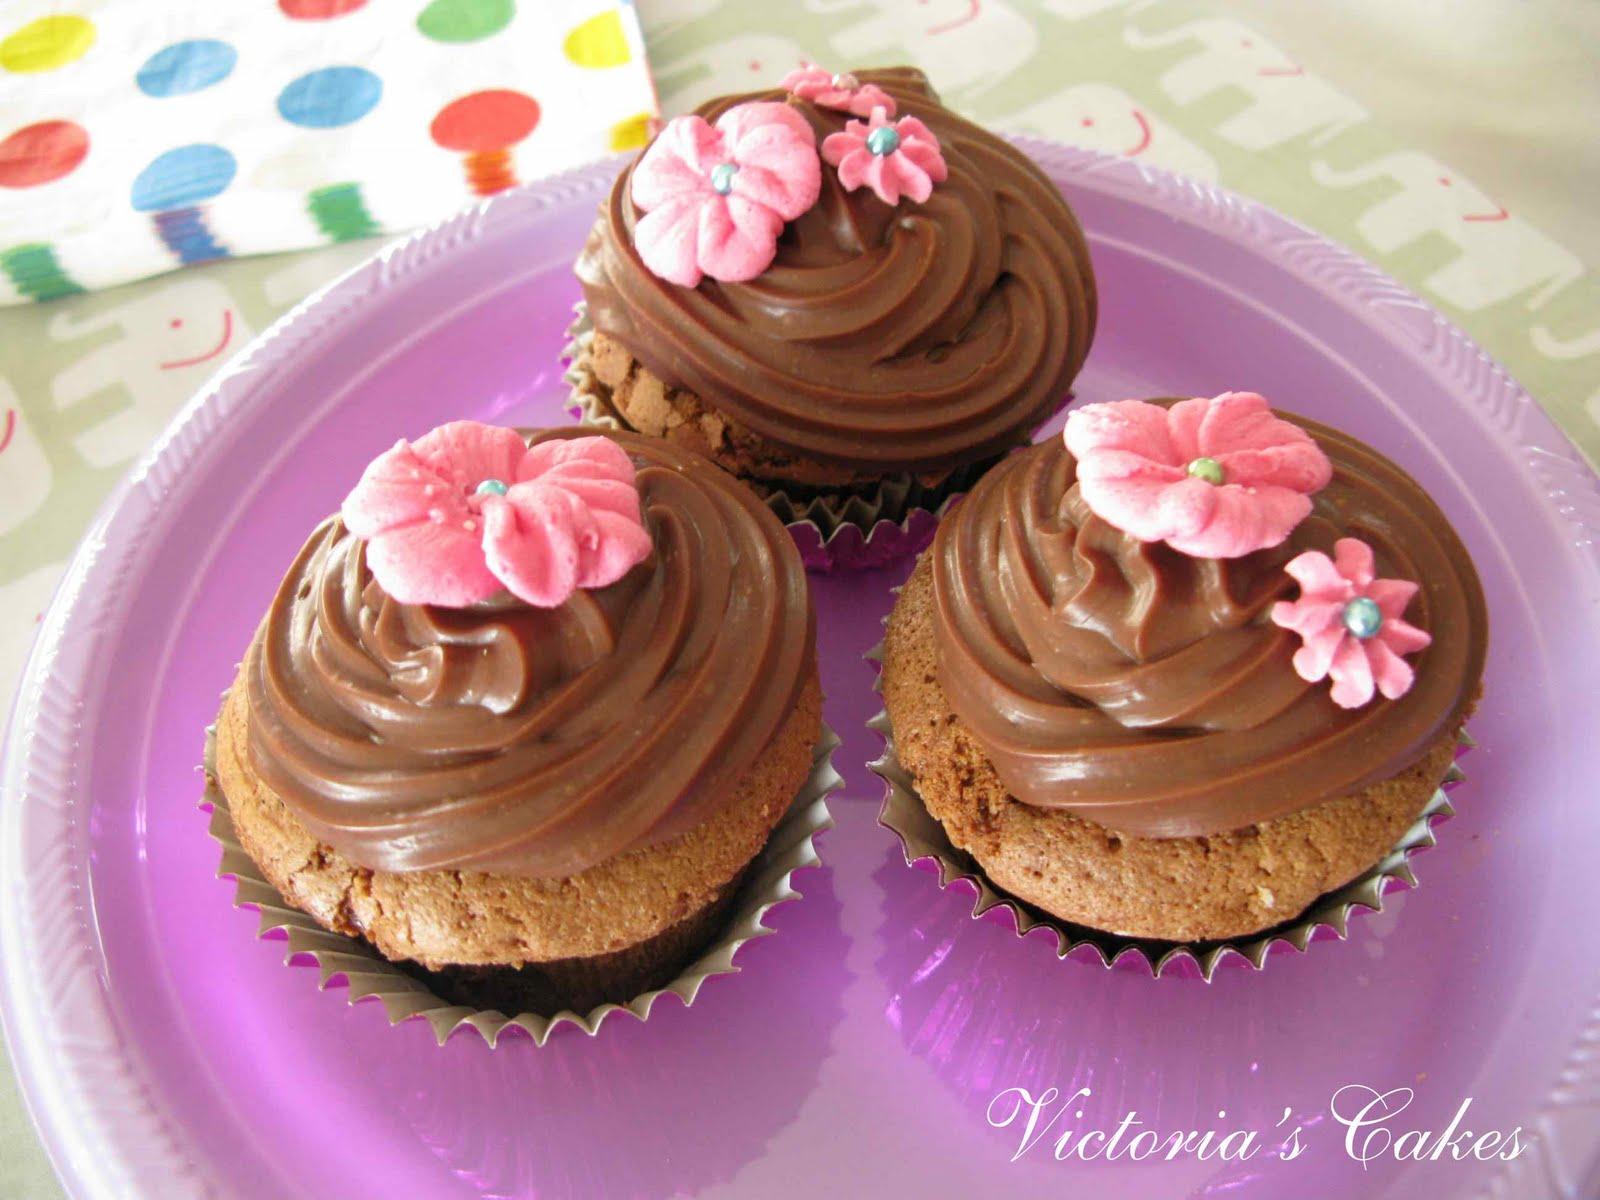 Crema Chocolate Relleno Rellenos Bombones Crema de